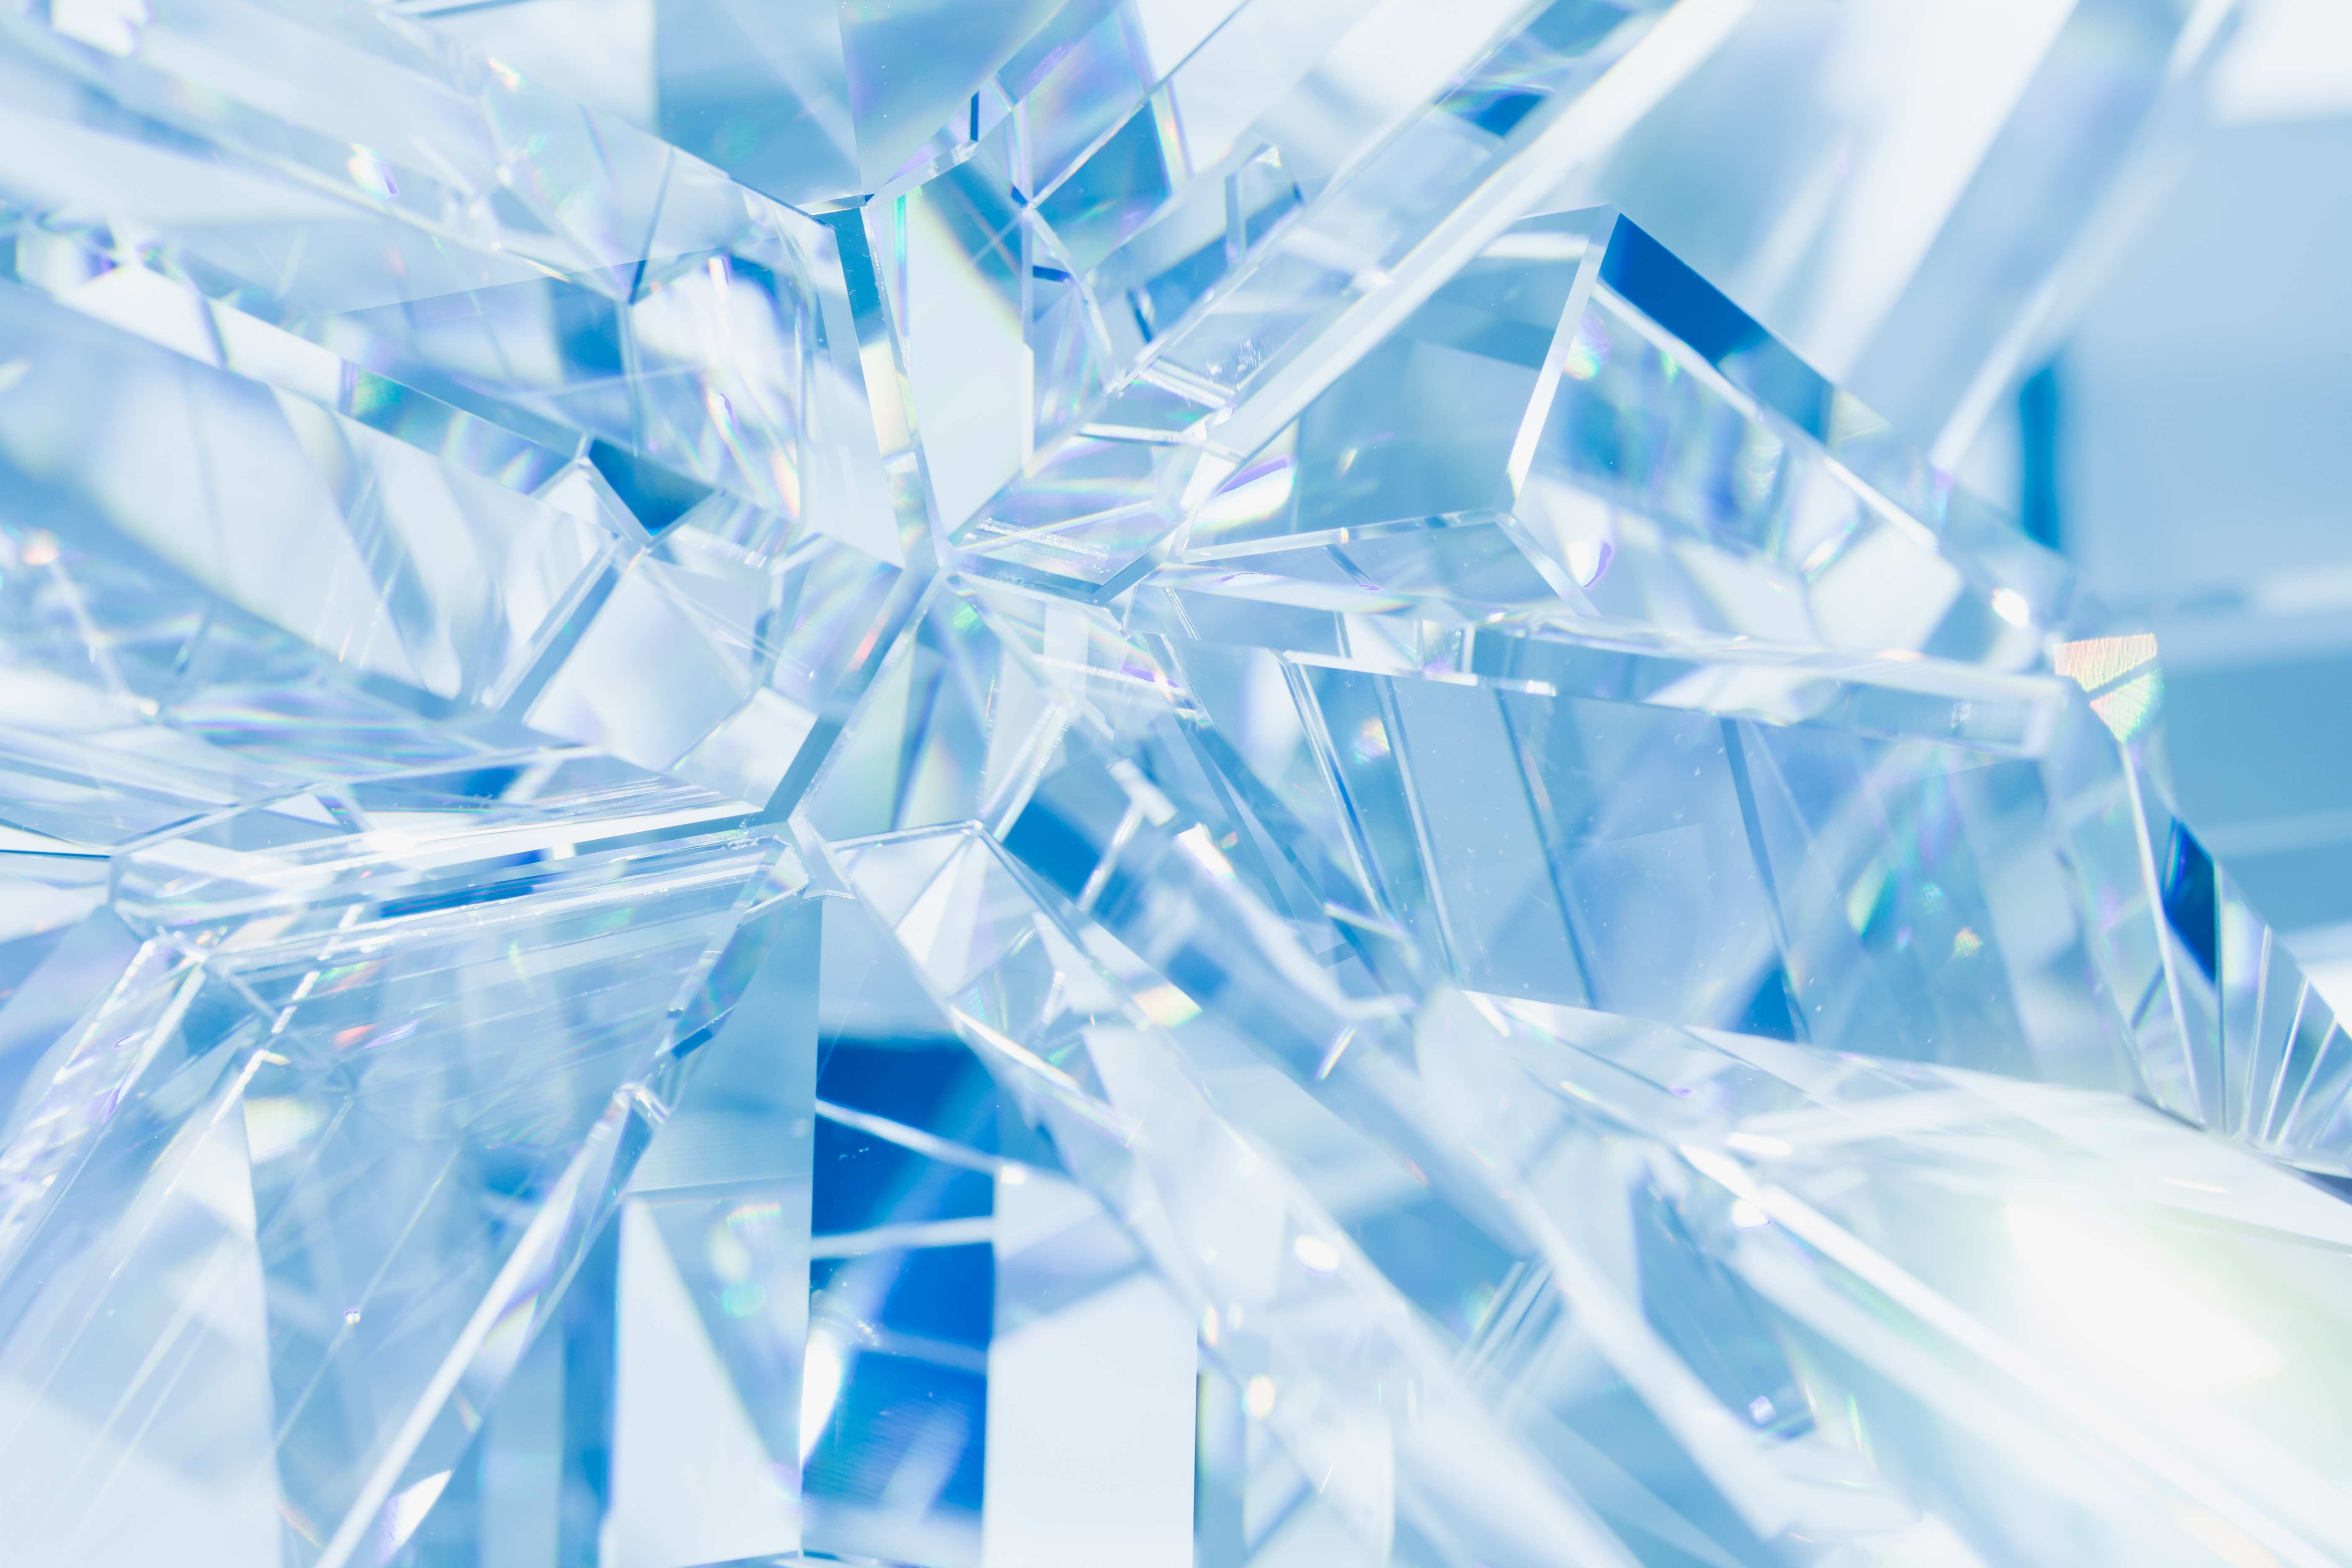 Crystal Encounters business for sale Sunshine Coast QLD $200,000 + S.A.V